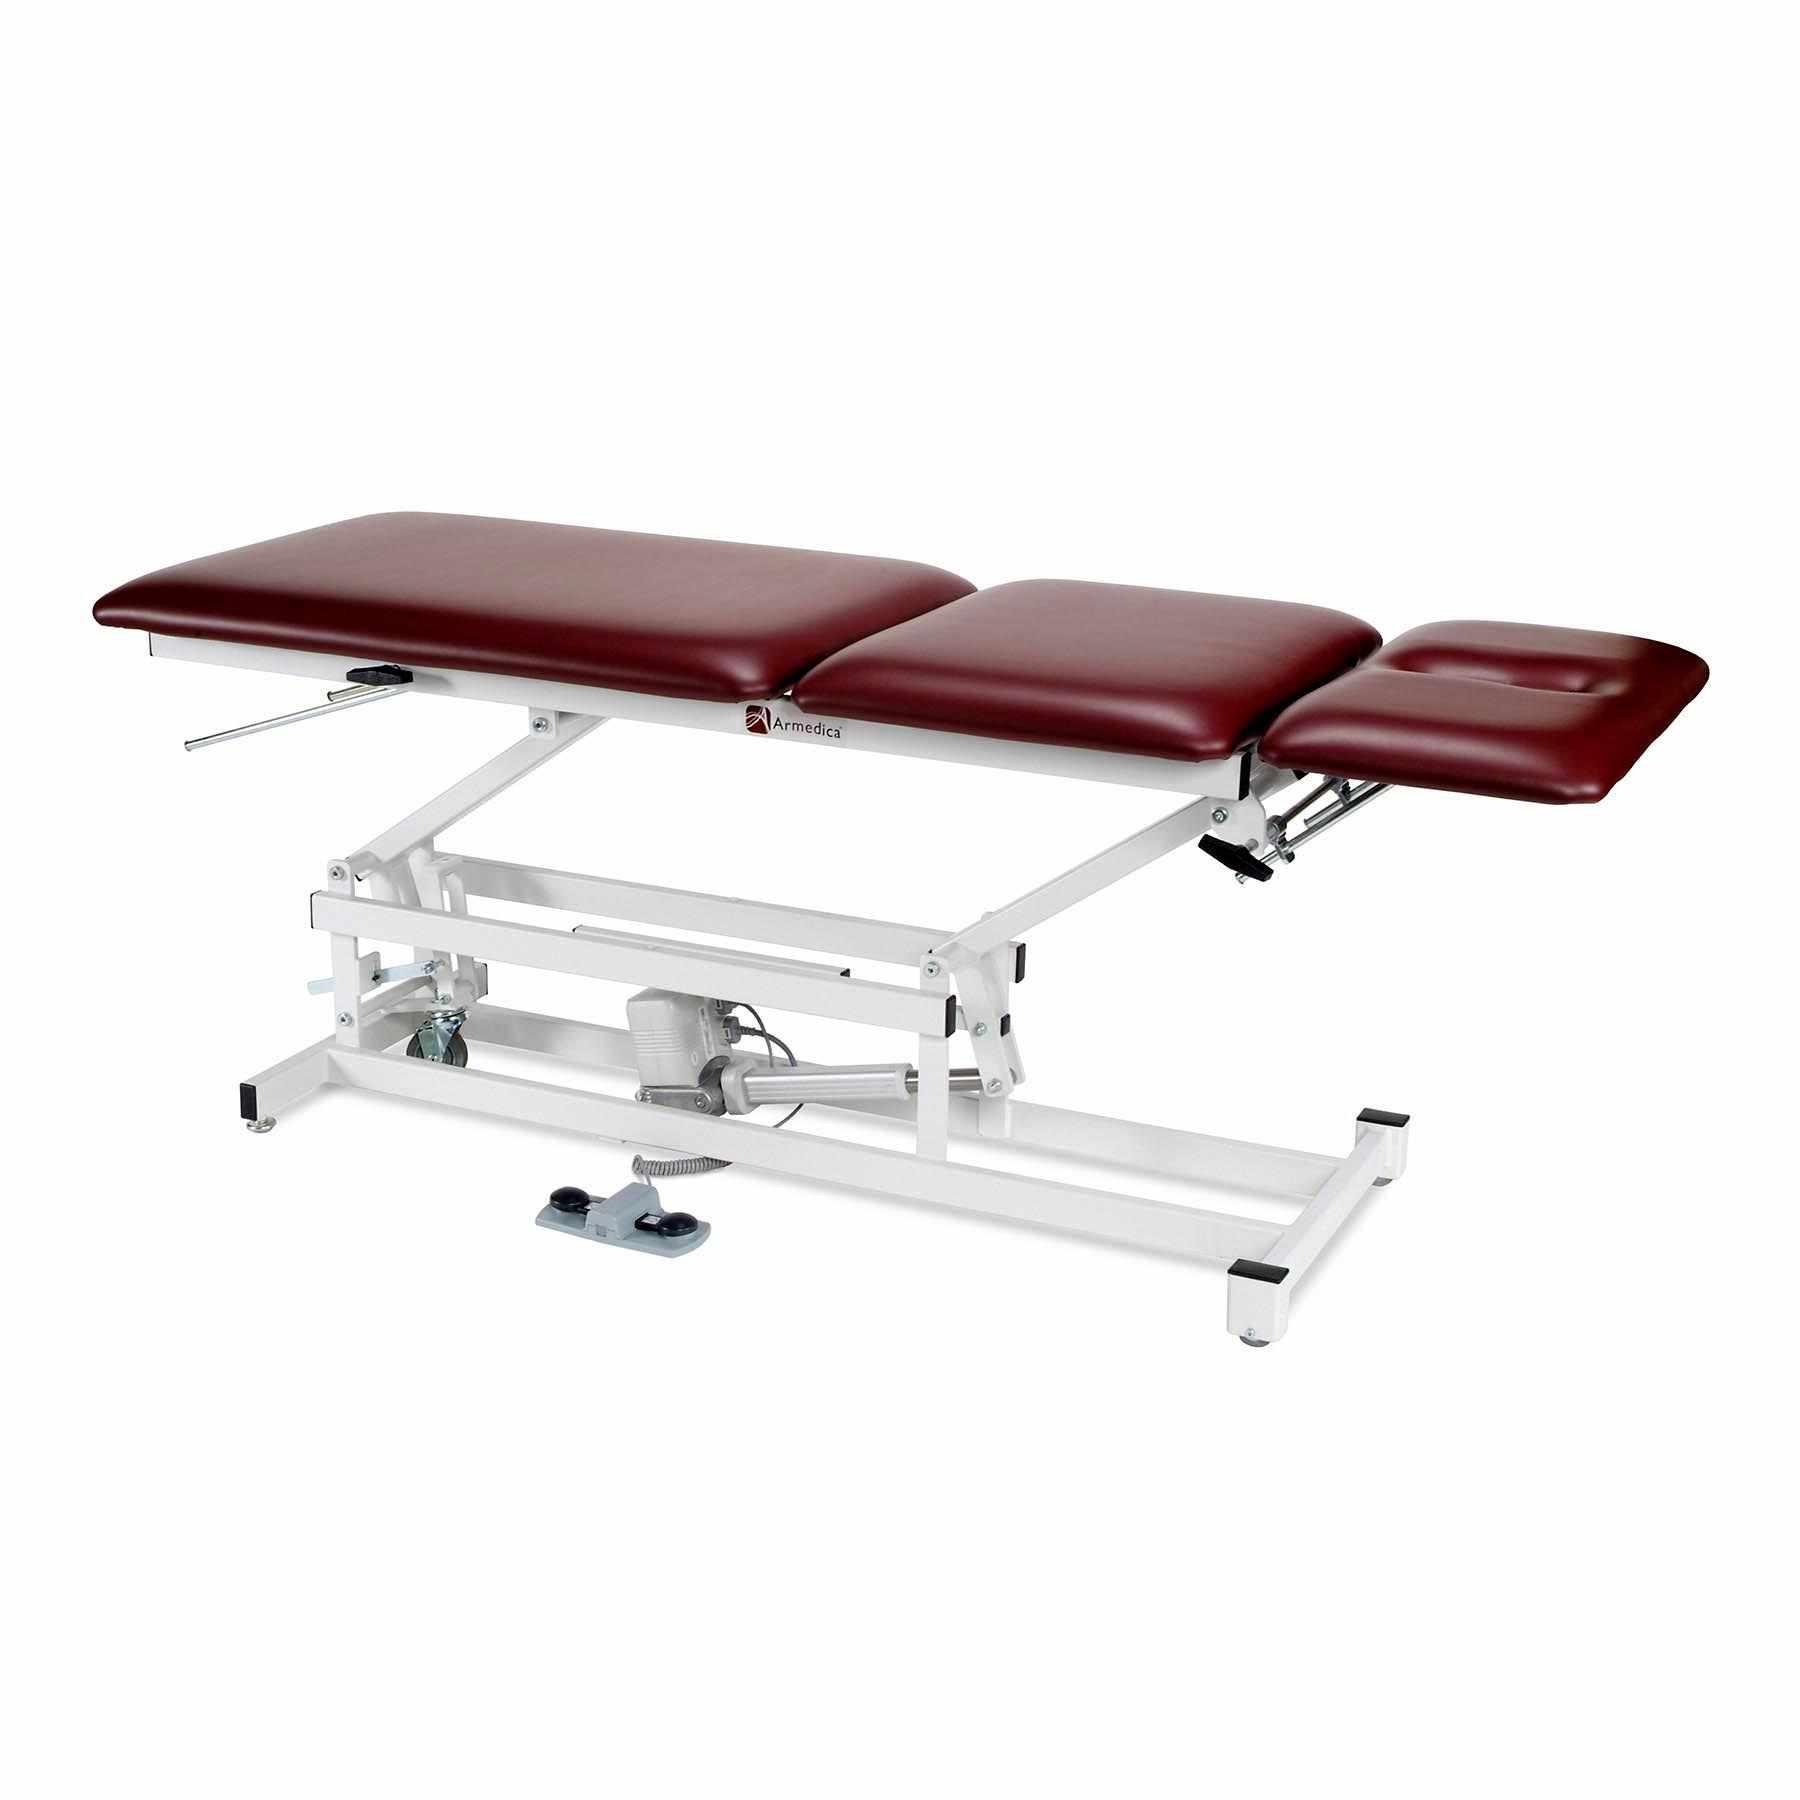 Armedica AM-350 treatment table